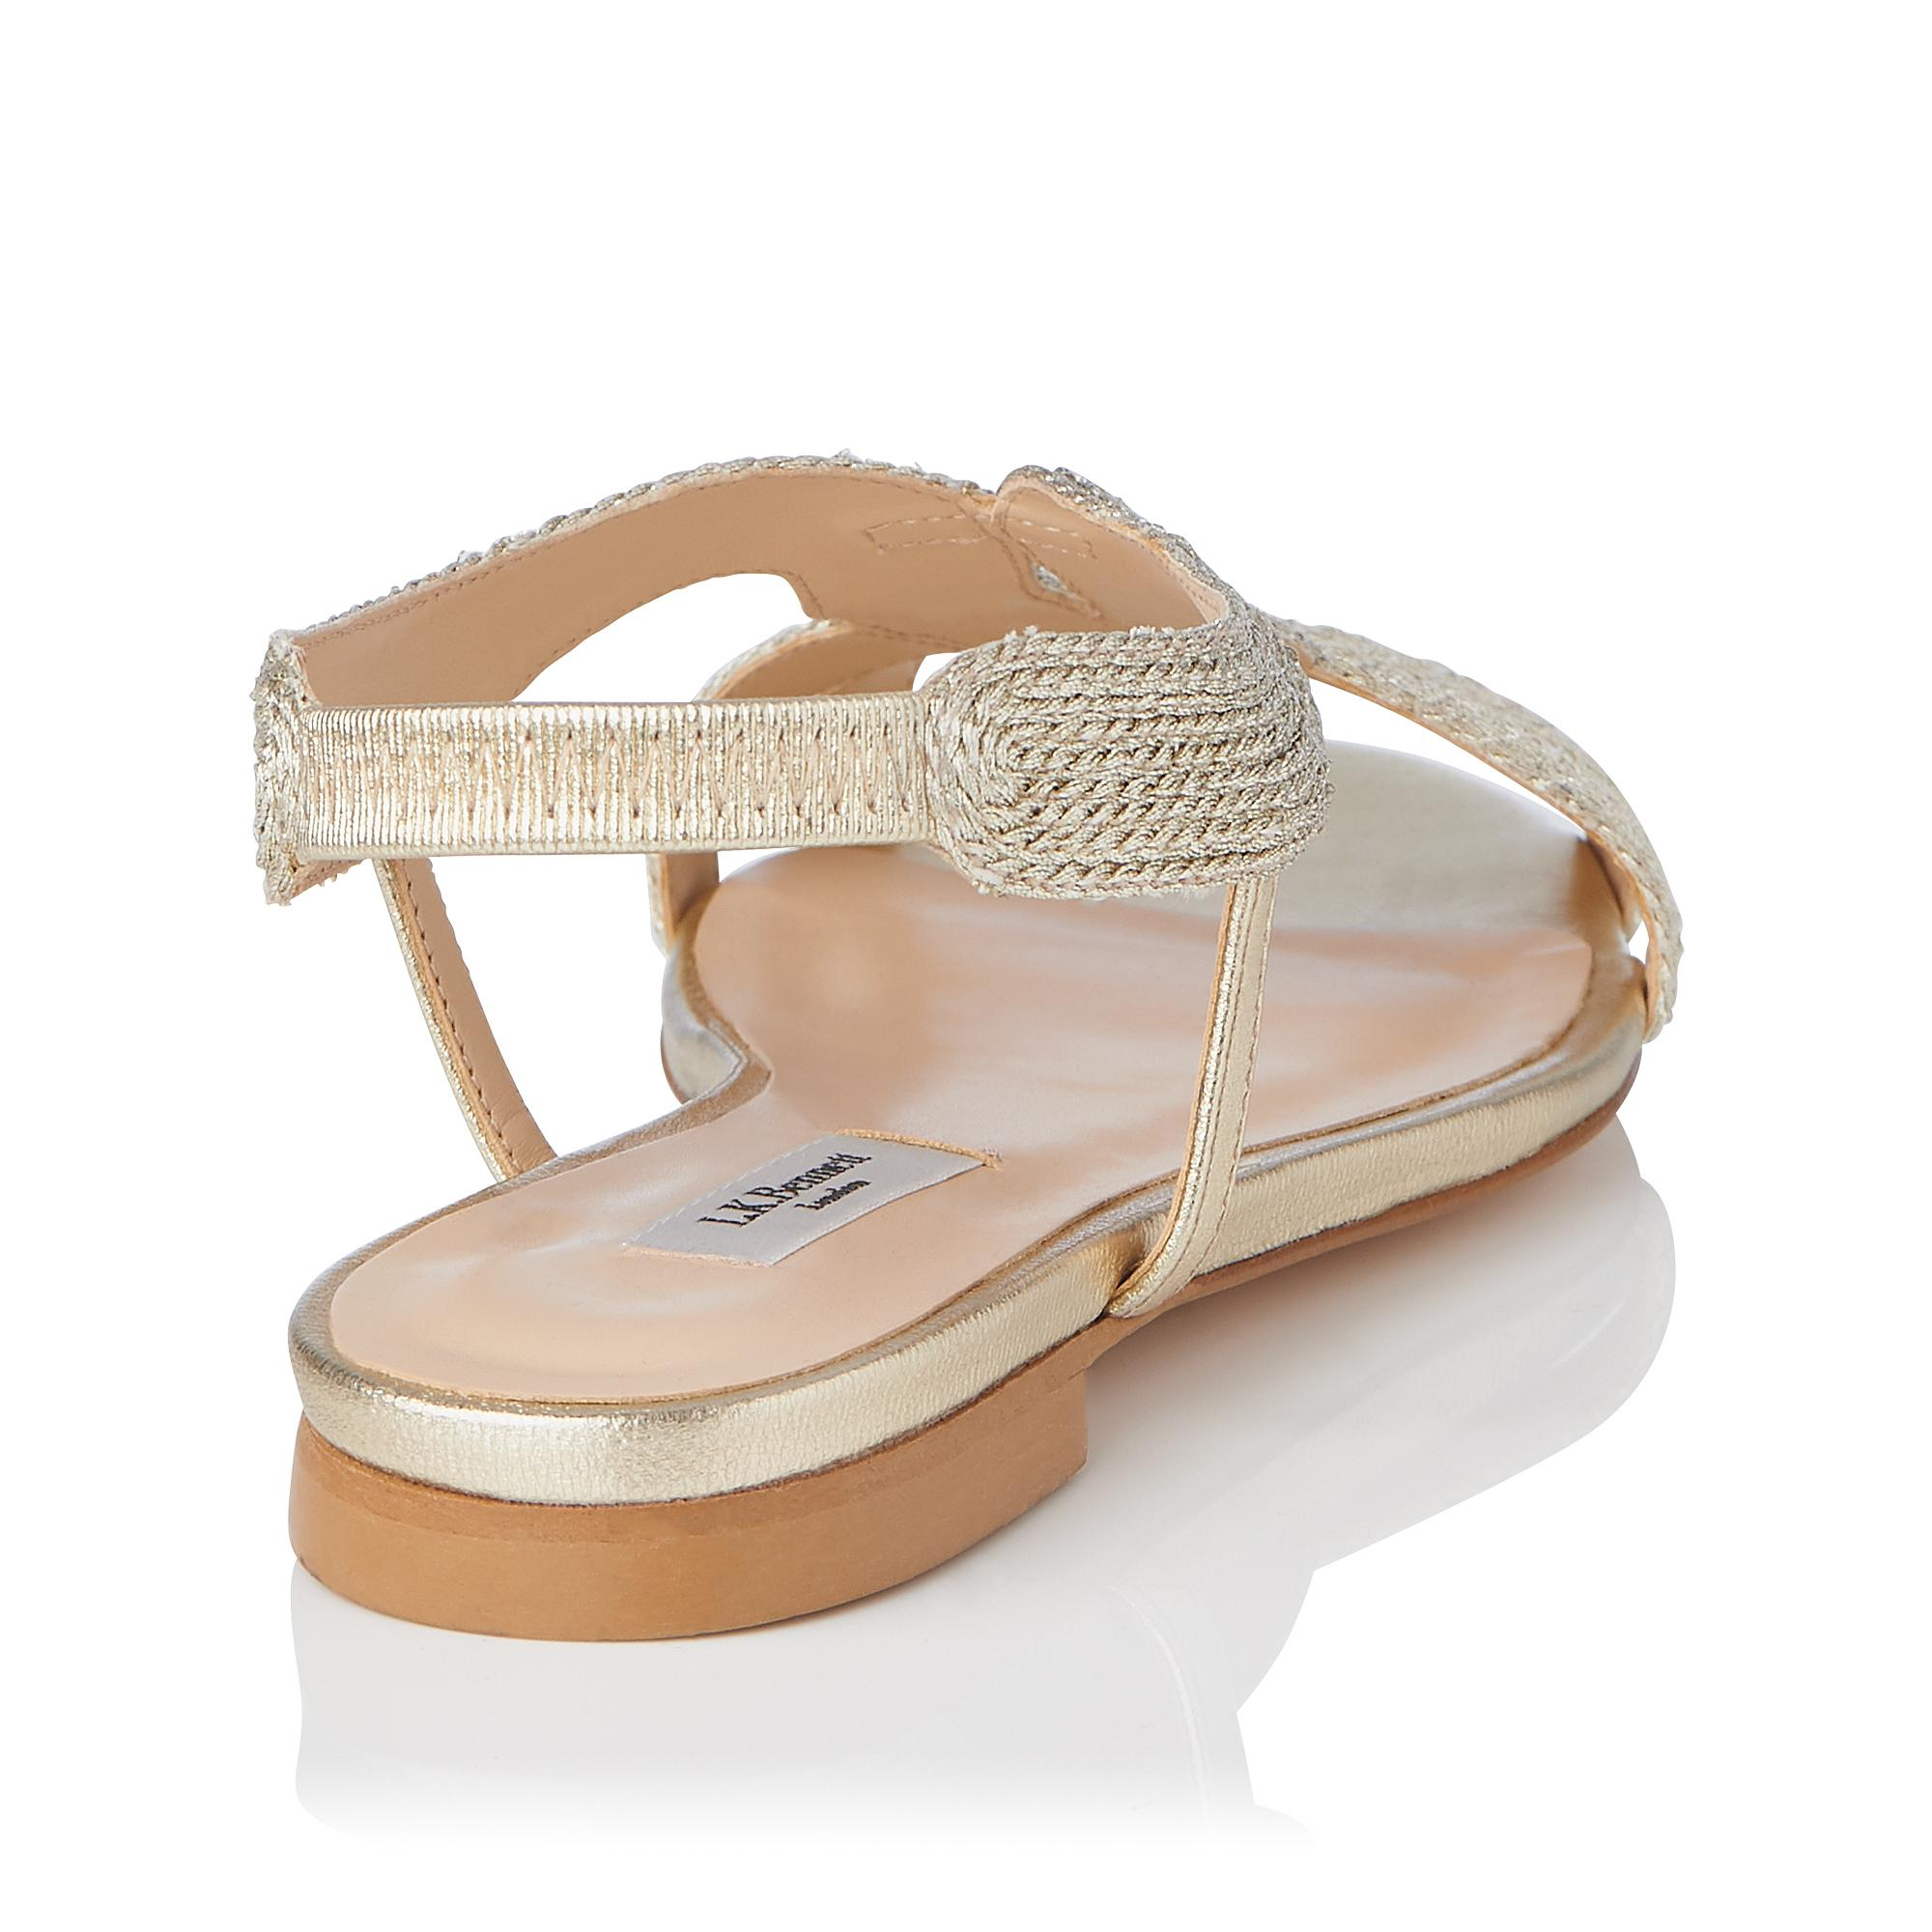 3f0e4aaa76bb ... Maya Rope Flat Sandals. Tap to zoom